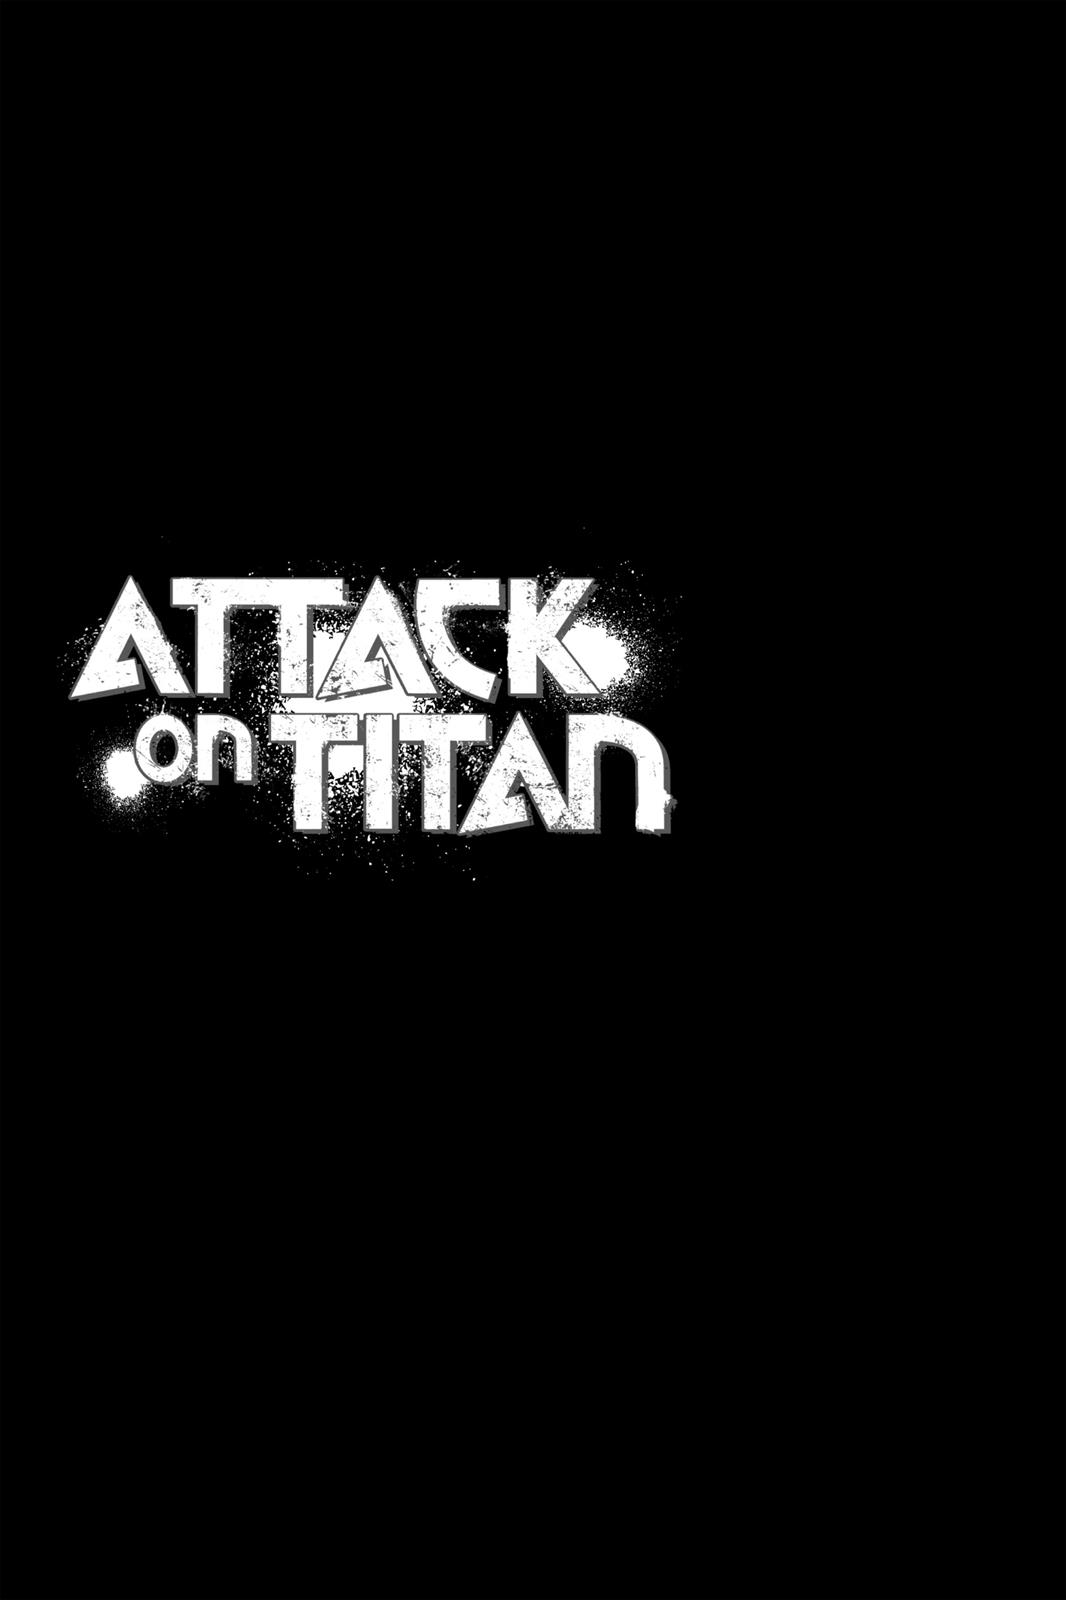 Attack On Titan, Episode 77 image 046